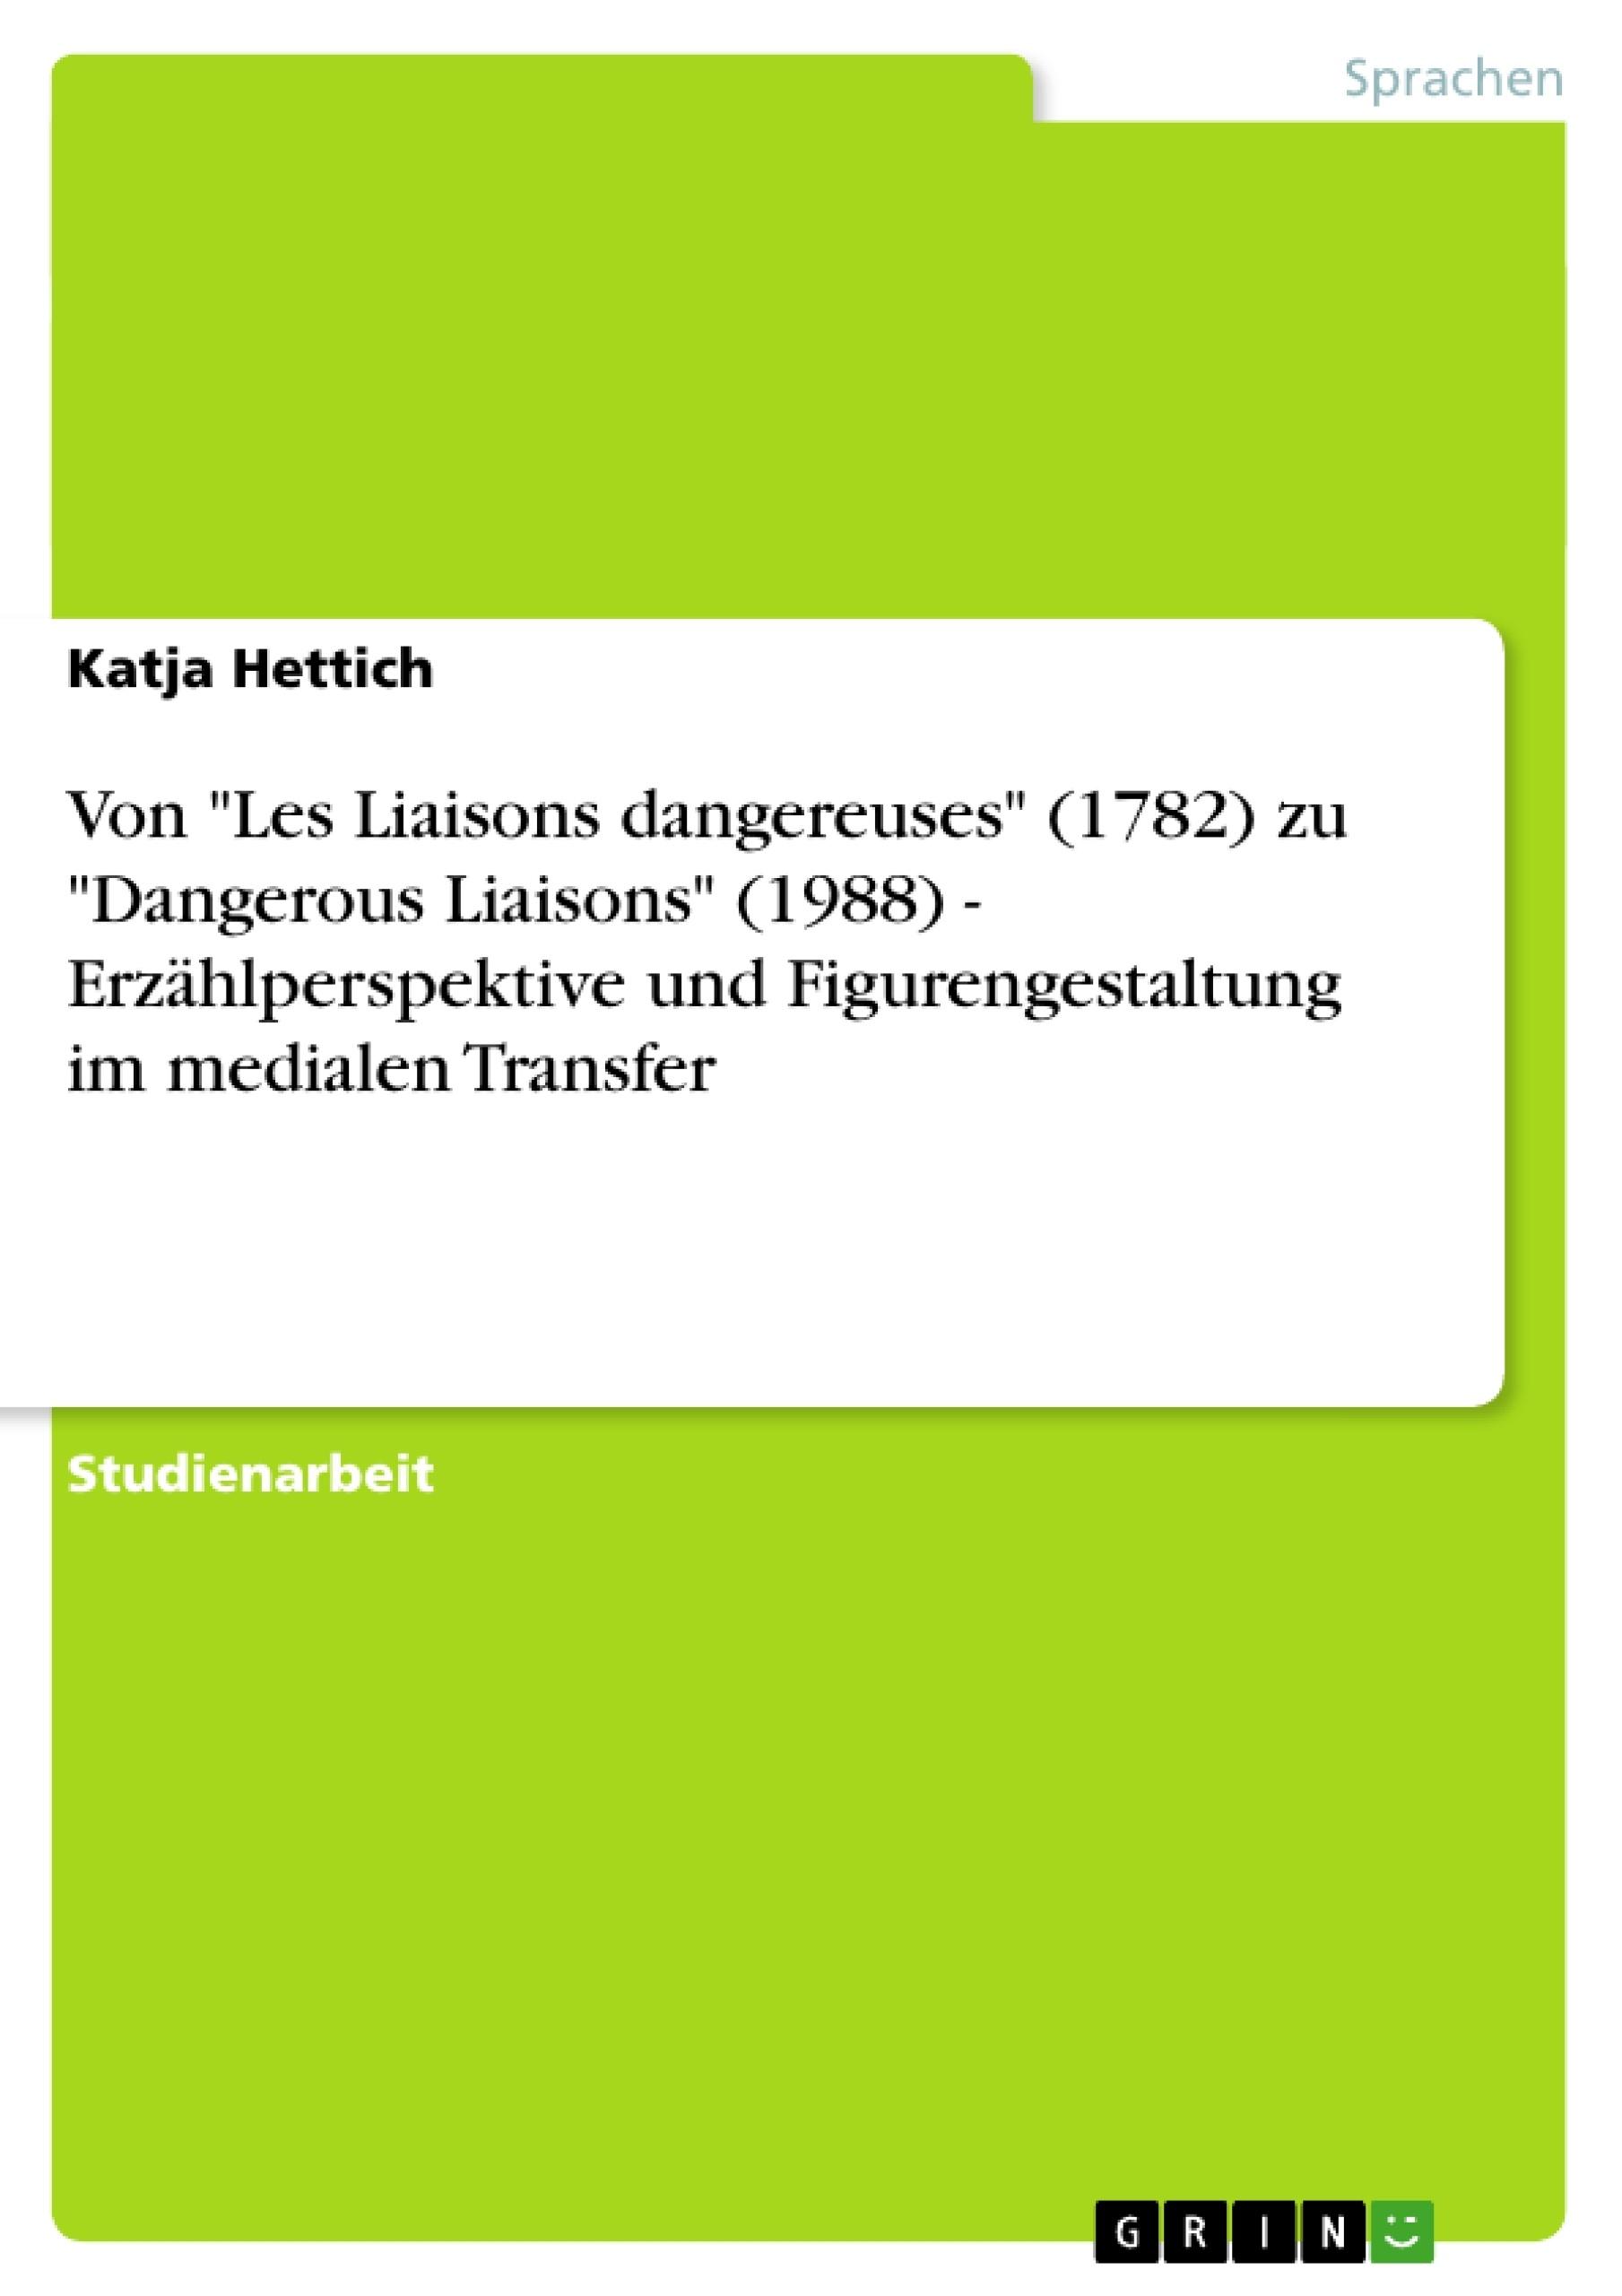 "Titel: Von ""Les Liaisons dangereuses"" (1782) zu ""Dangerous Liaisons"" (1988) - Erzählperspektive und Figurengestaltung im medialen Transfer"